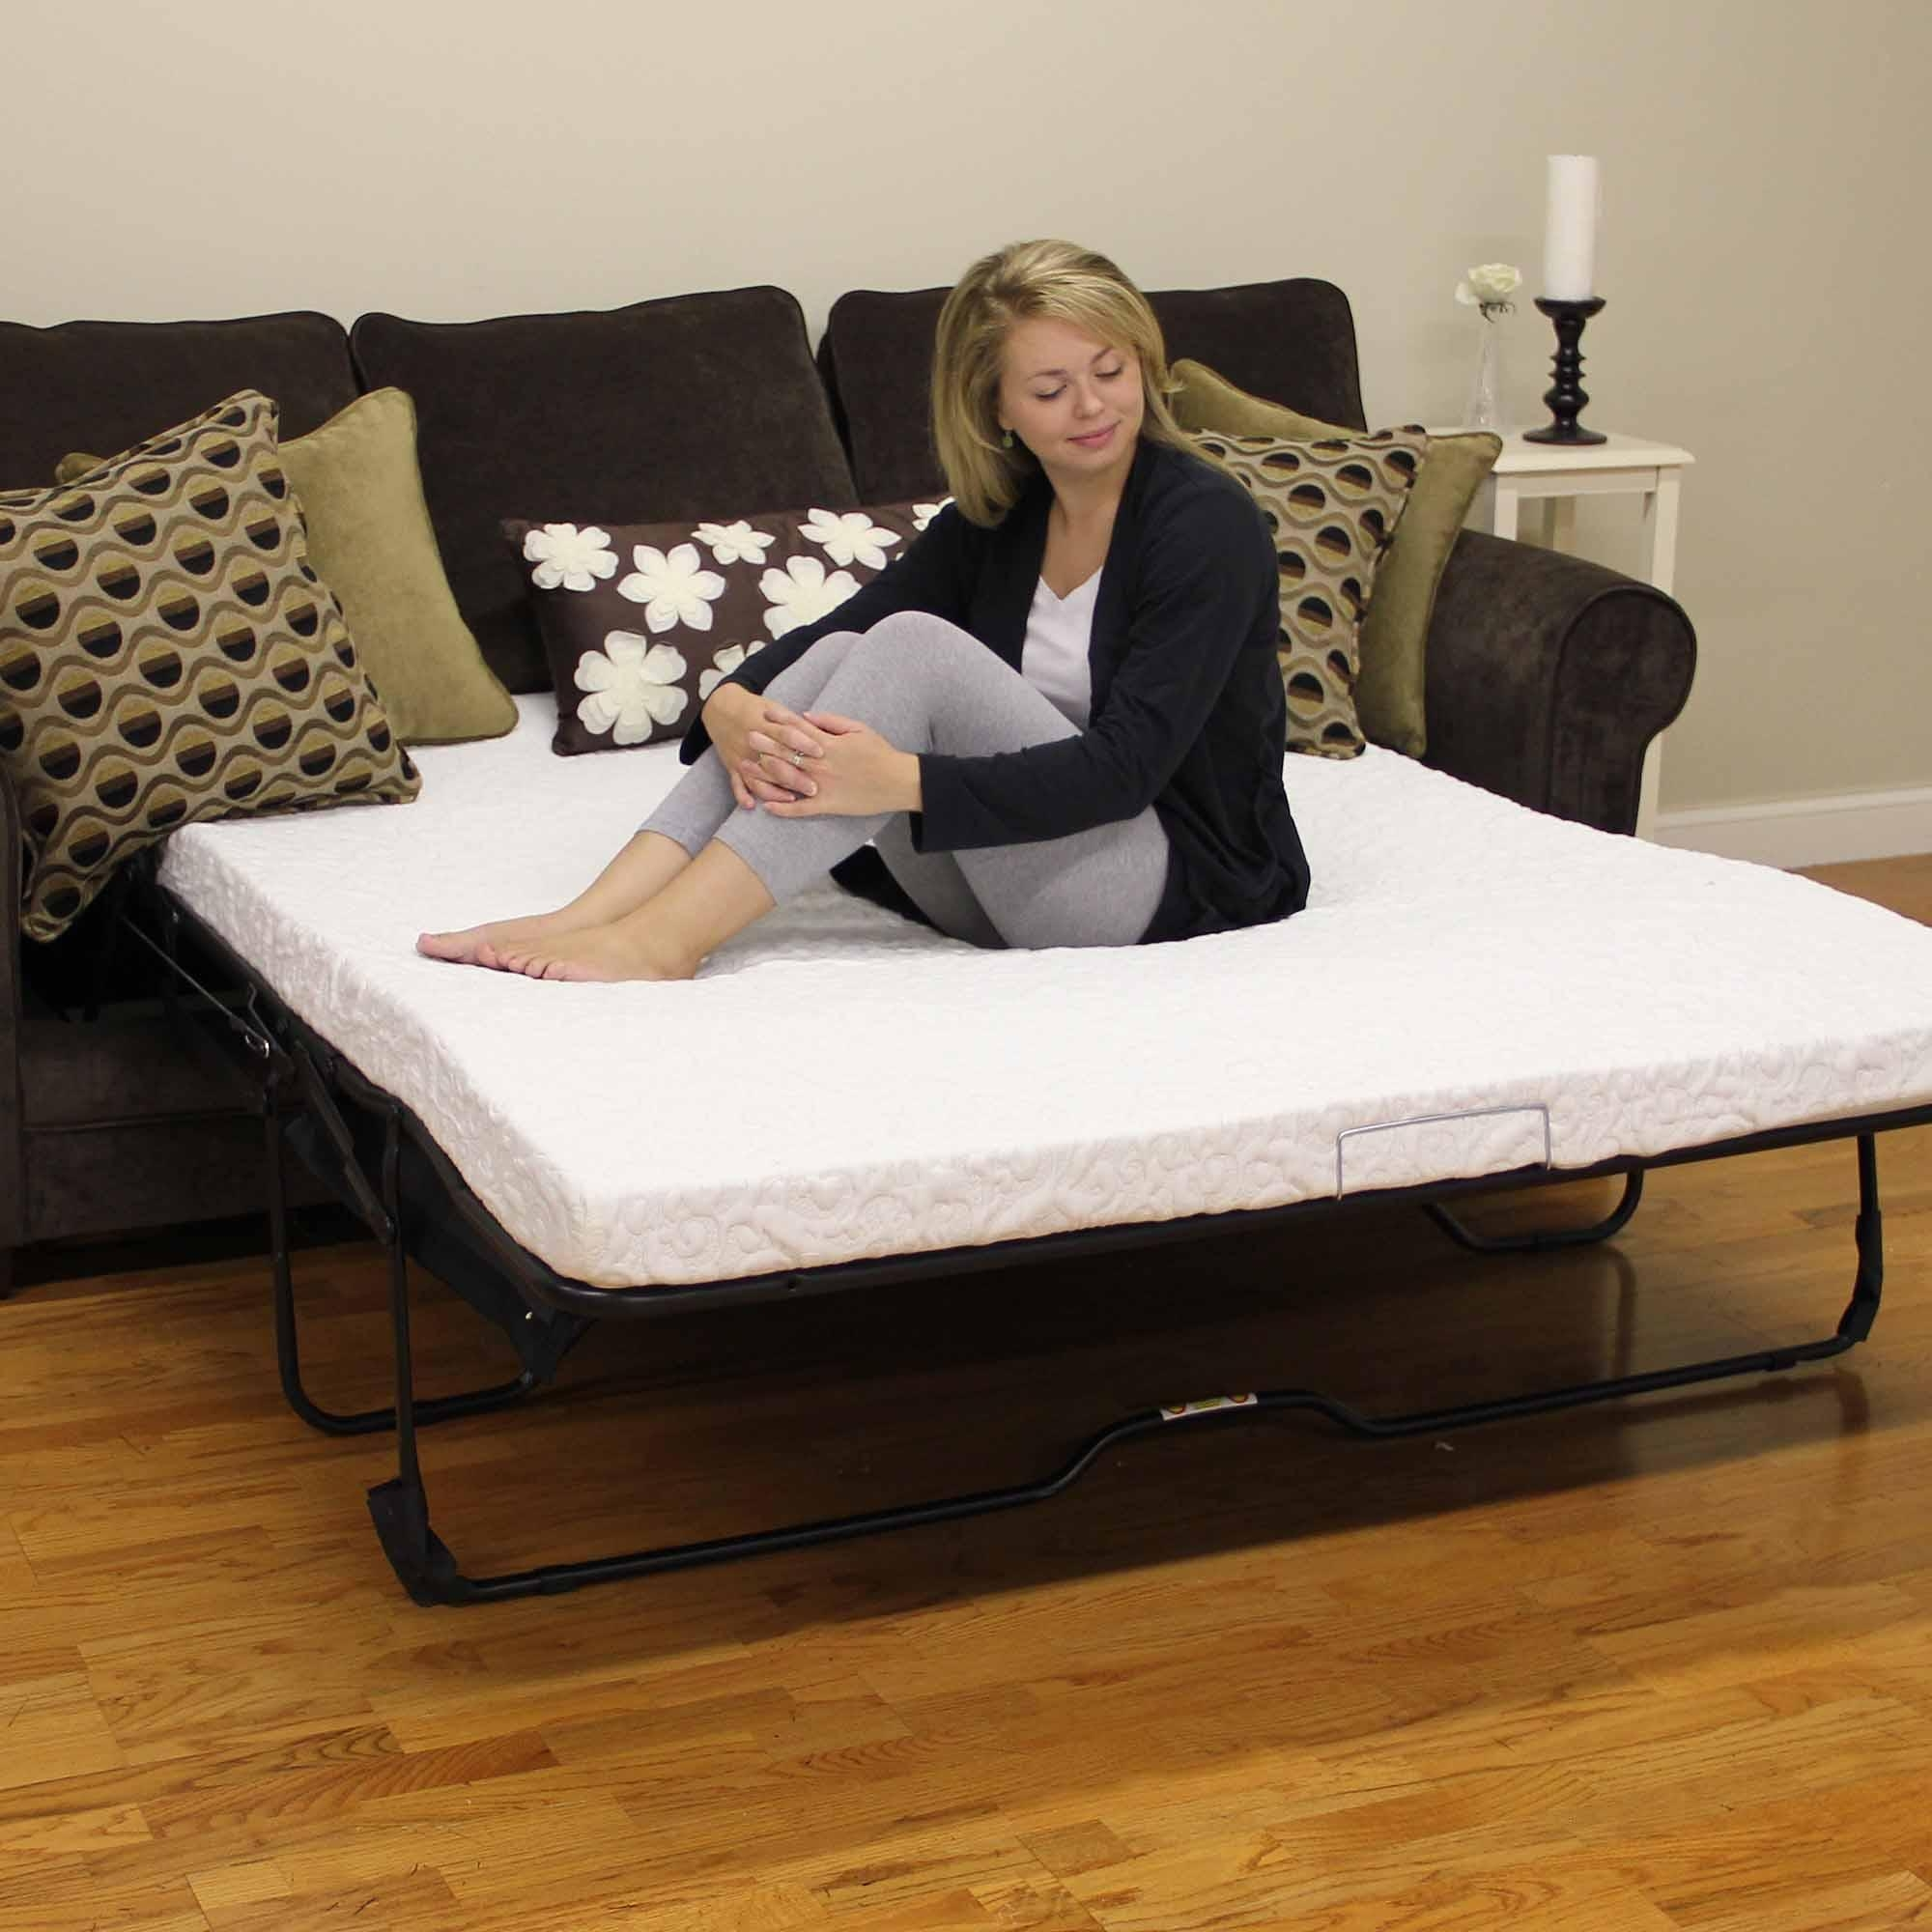 queen size memory foam mattress for sleeper sofa upholstery sofas manchester 20 photos ideas